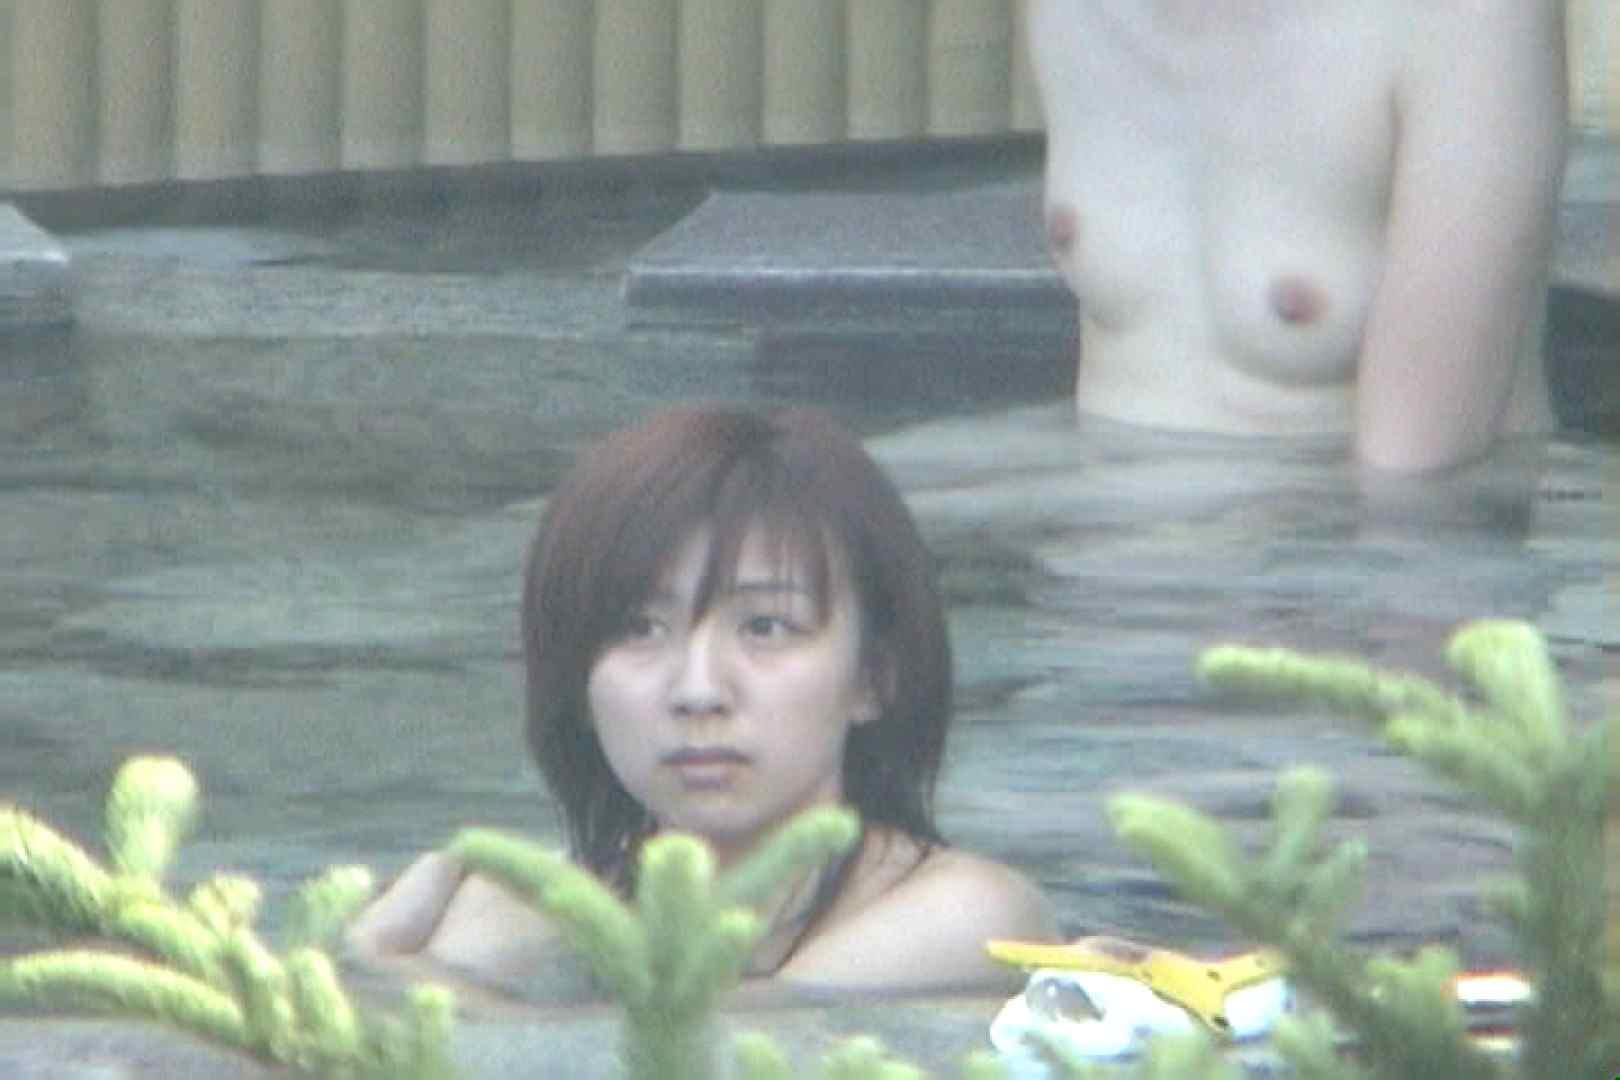 Aquaな露天風呂Vol.77【VIP限定】 盗撮師作品 おまんこ無修正動画無料 96pic 62